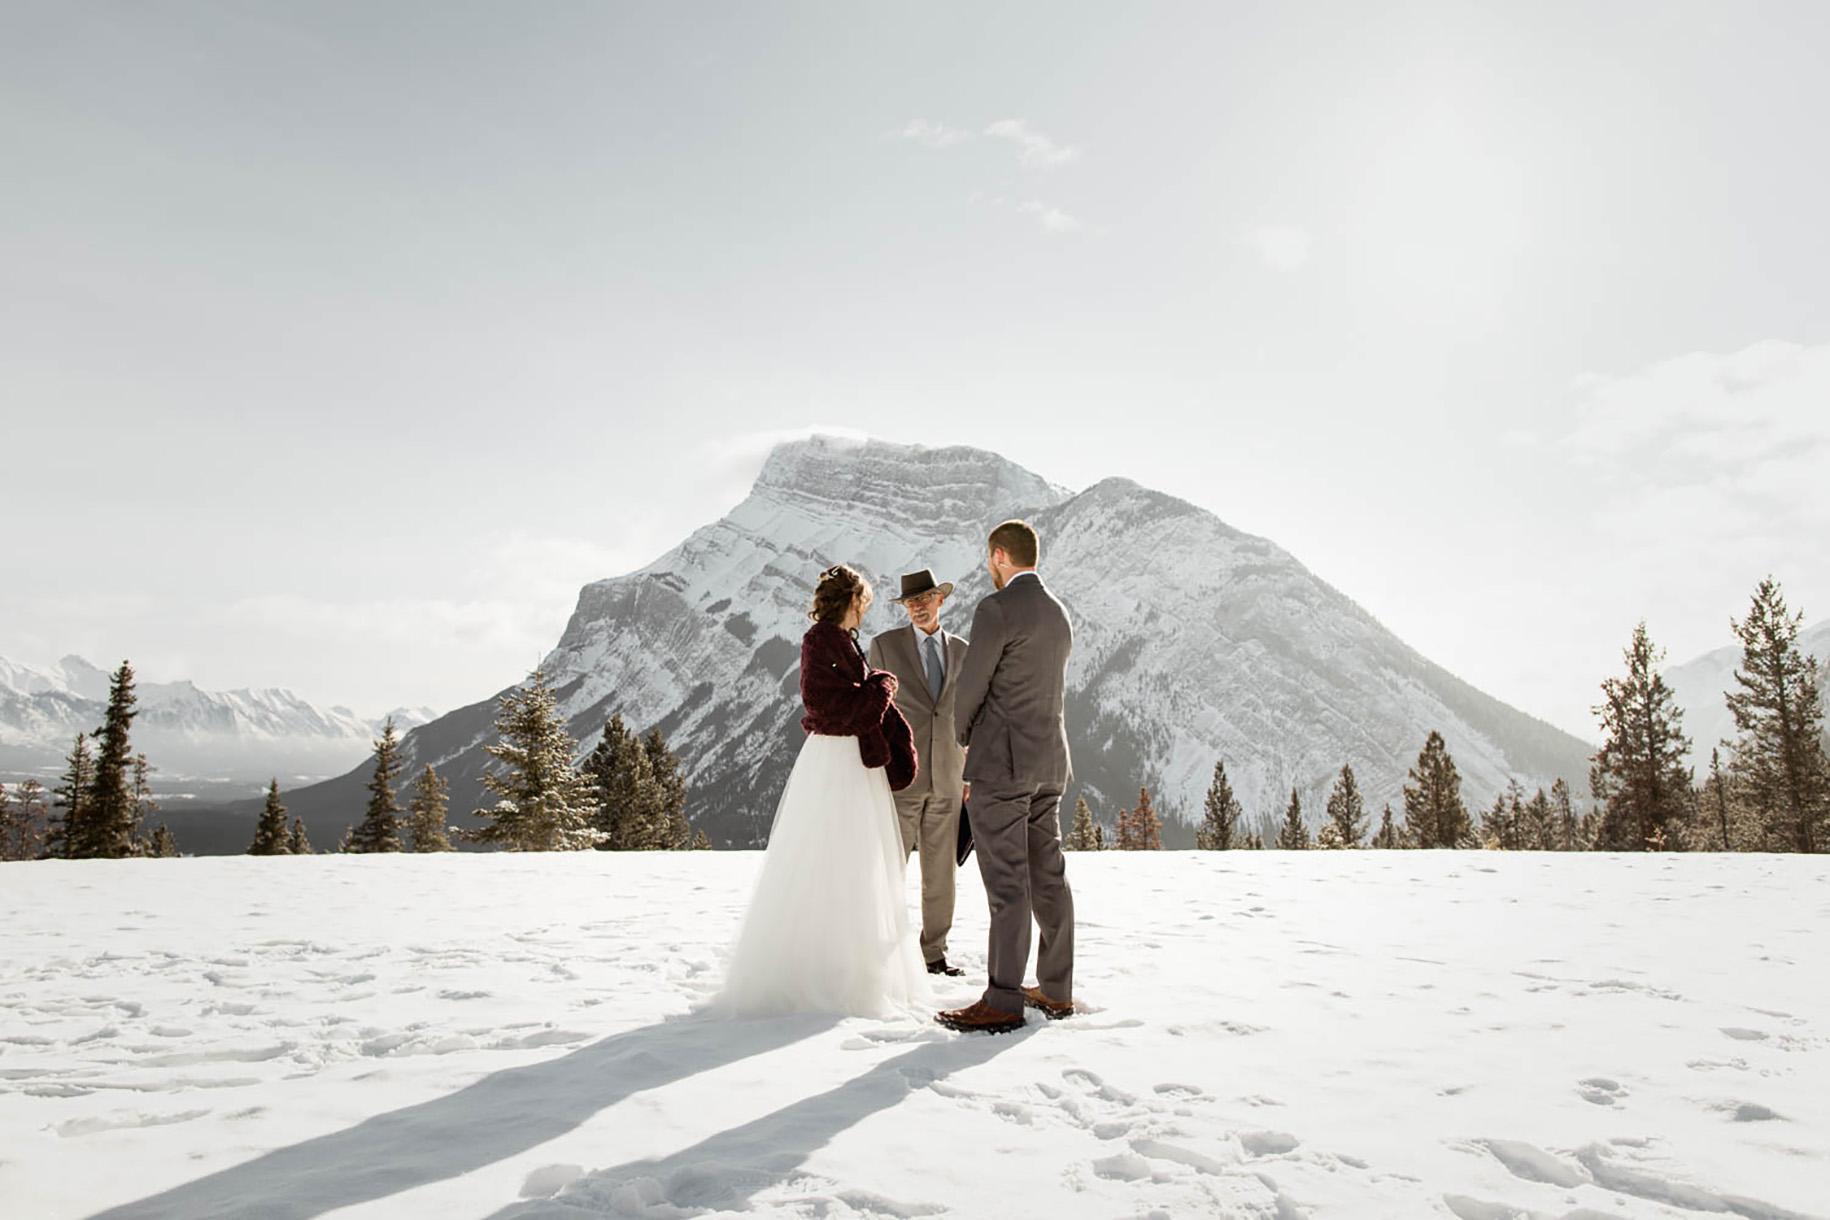 Banff Winter Elopement at Tunnel Mountain